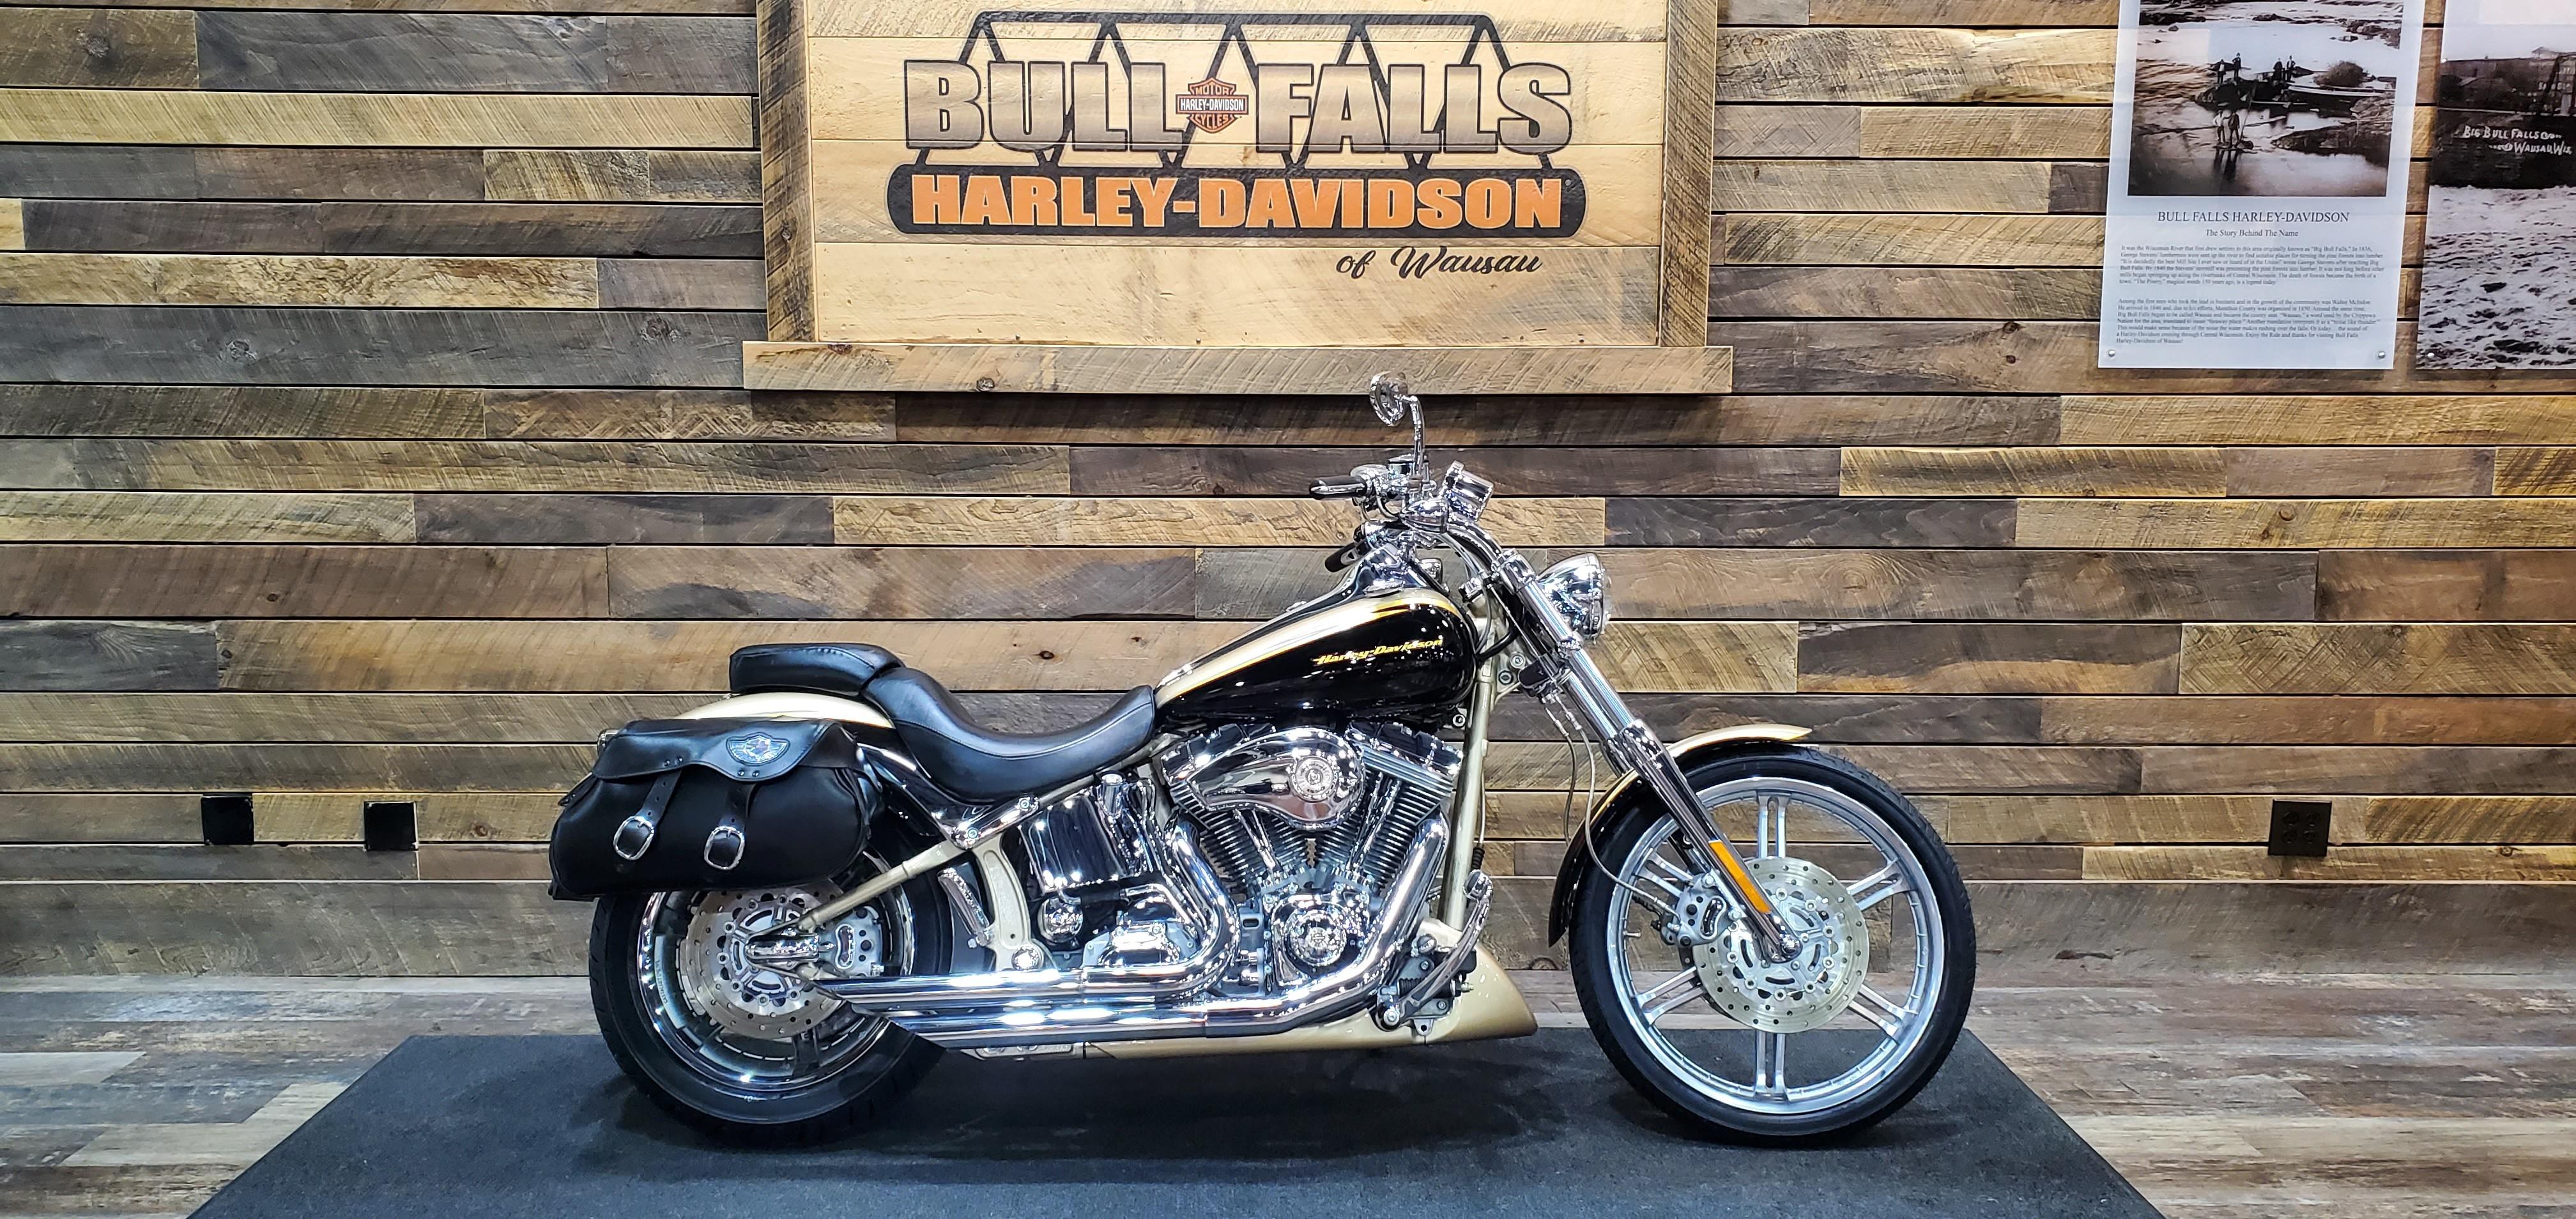 2003 Harley-Davidson FXSTDSE at Bull Falls Harley-Davidson